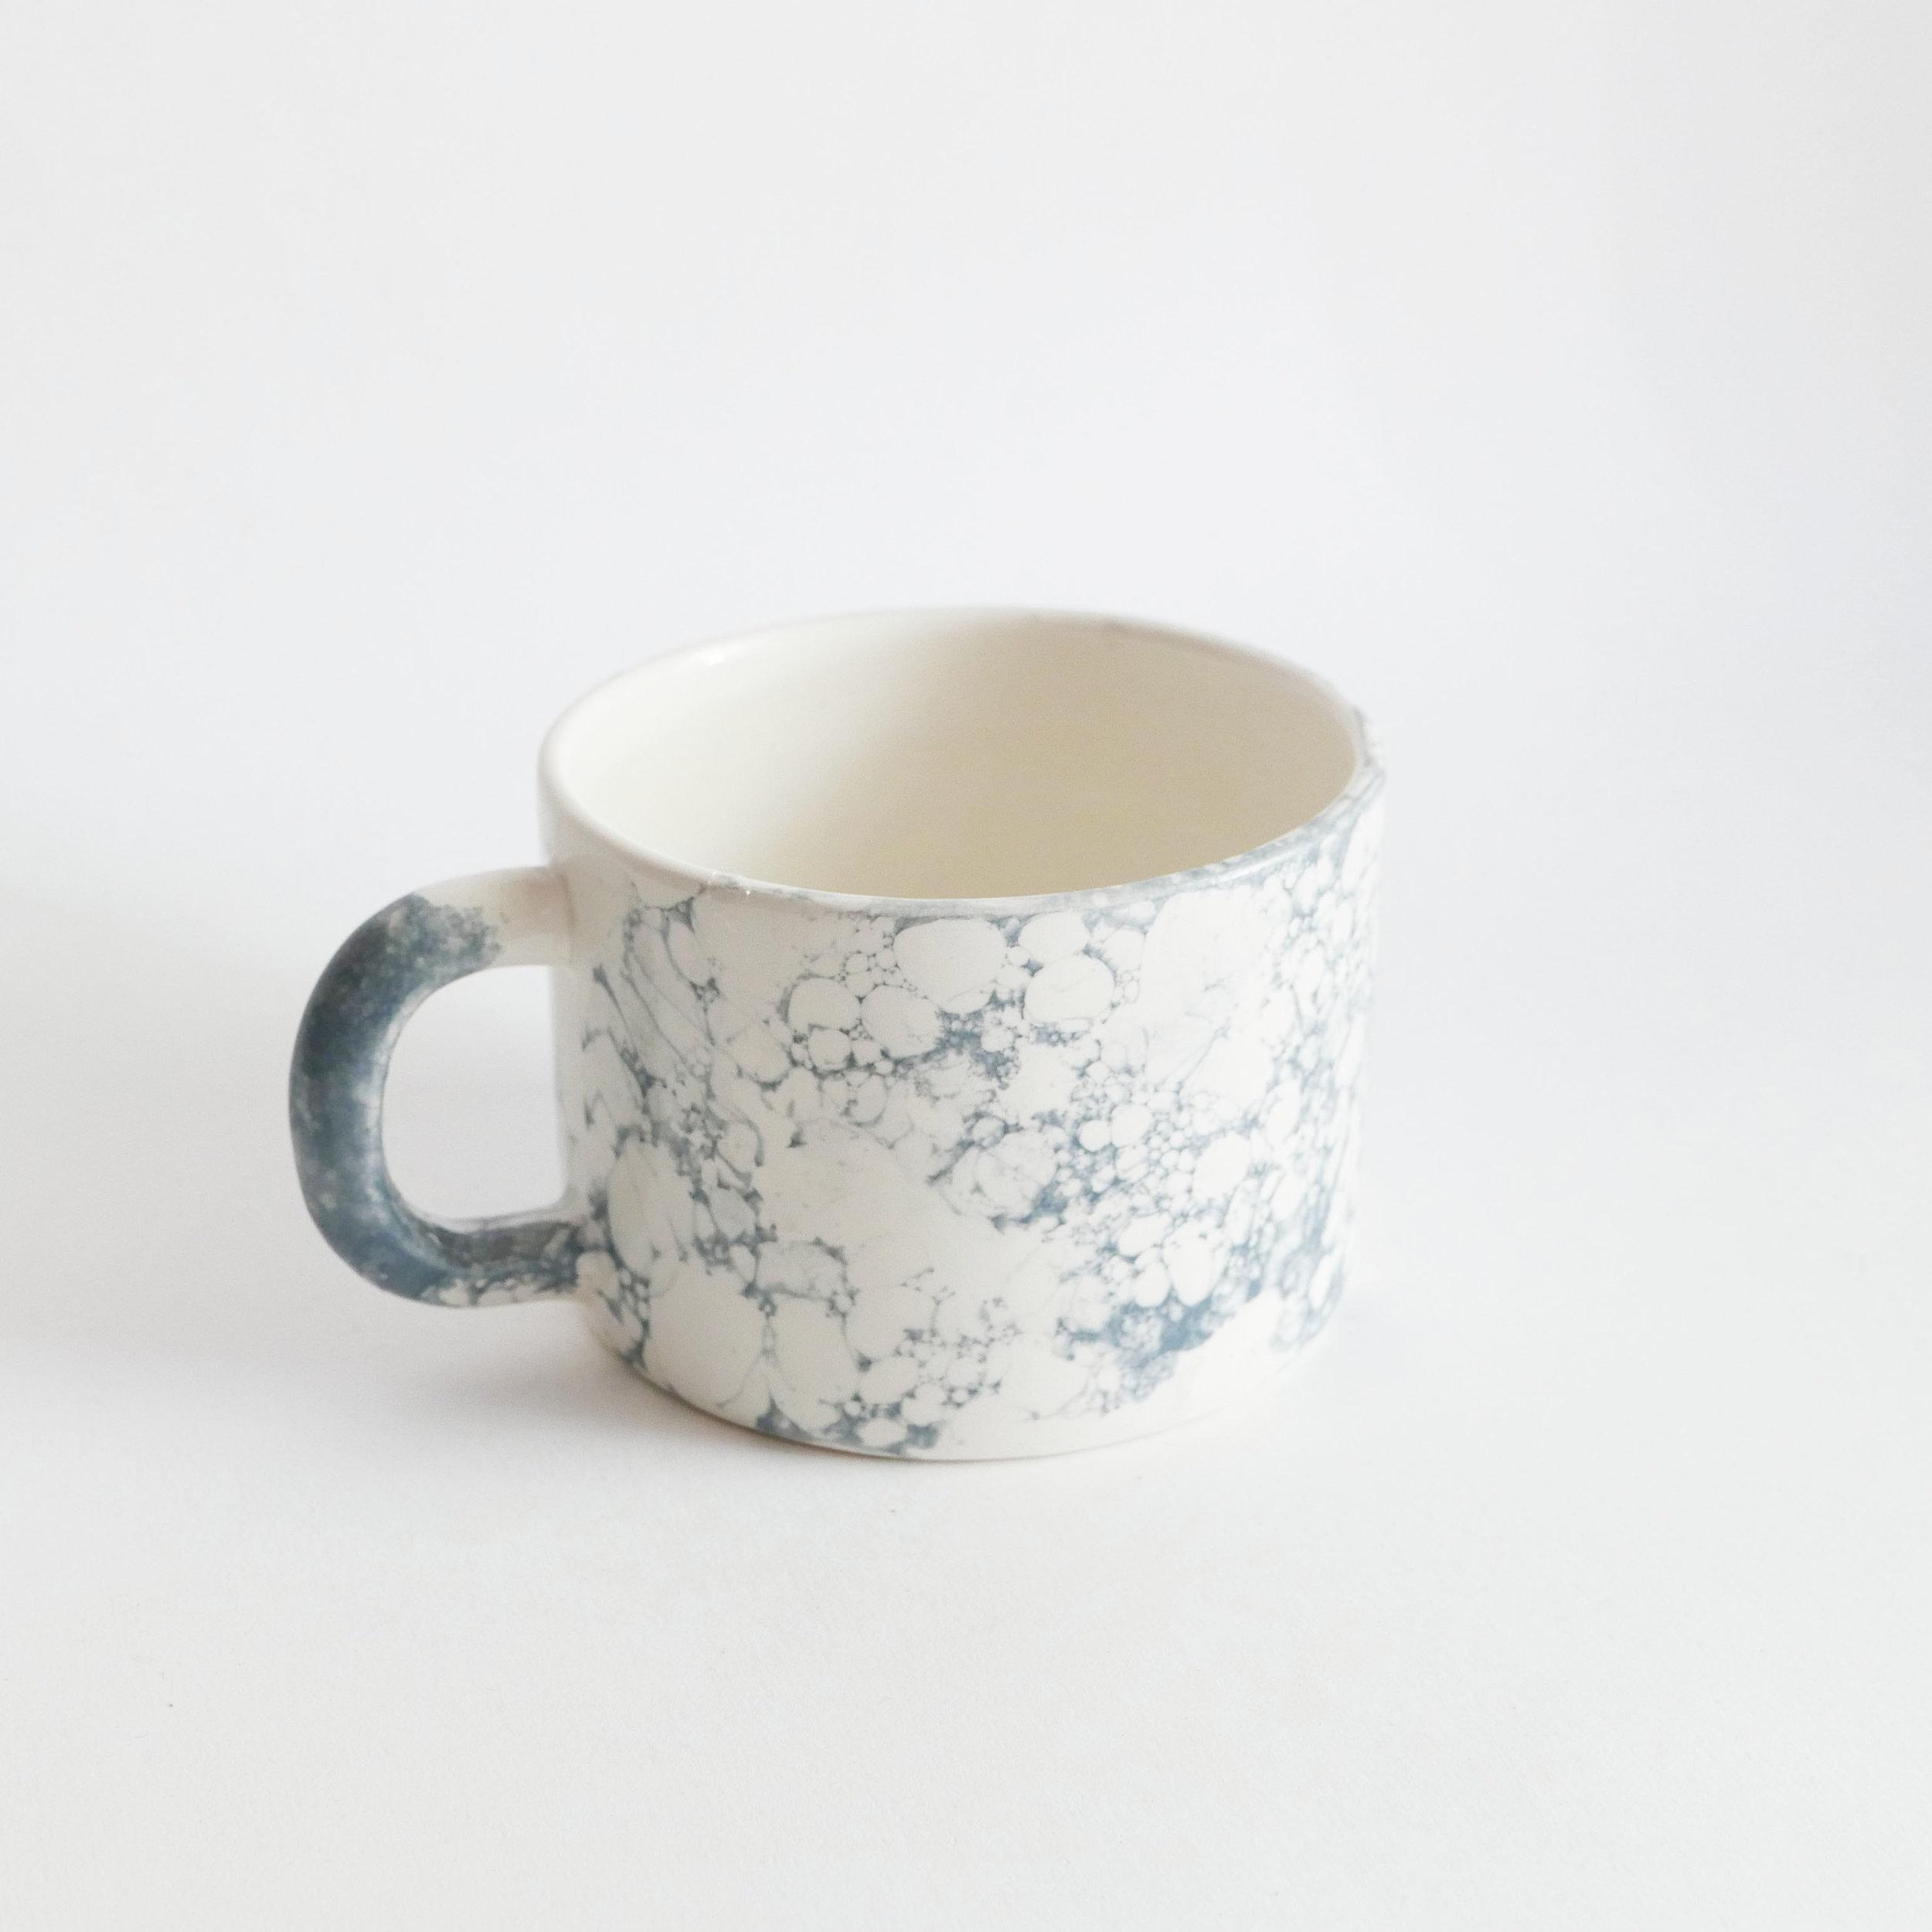 12€ - Tasses (bulles) en céramique. Datcha